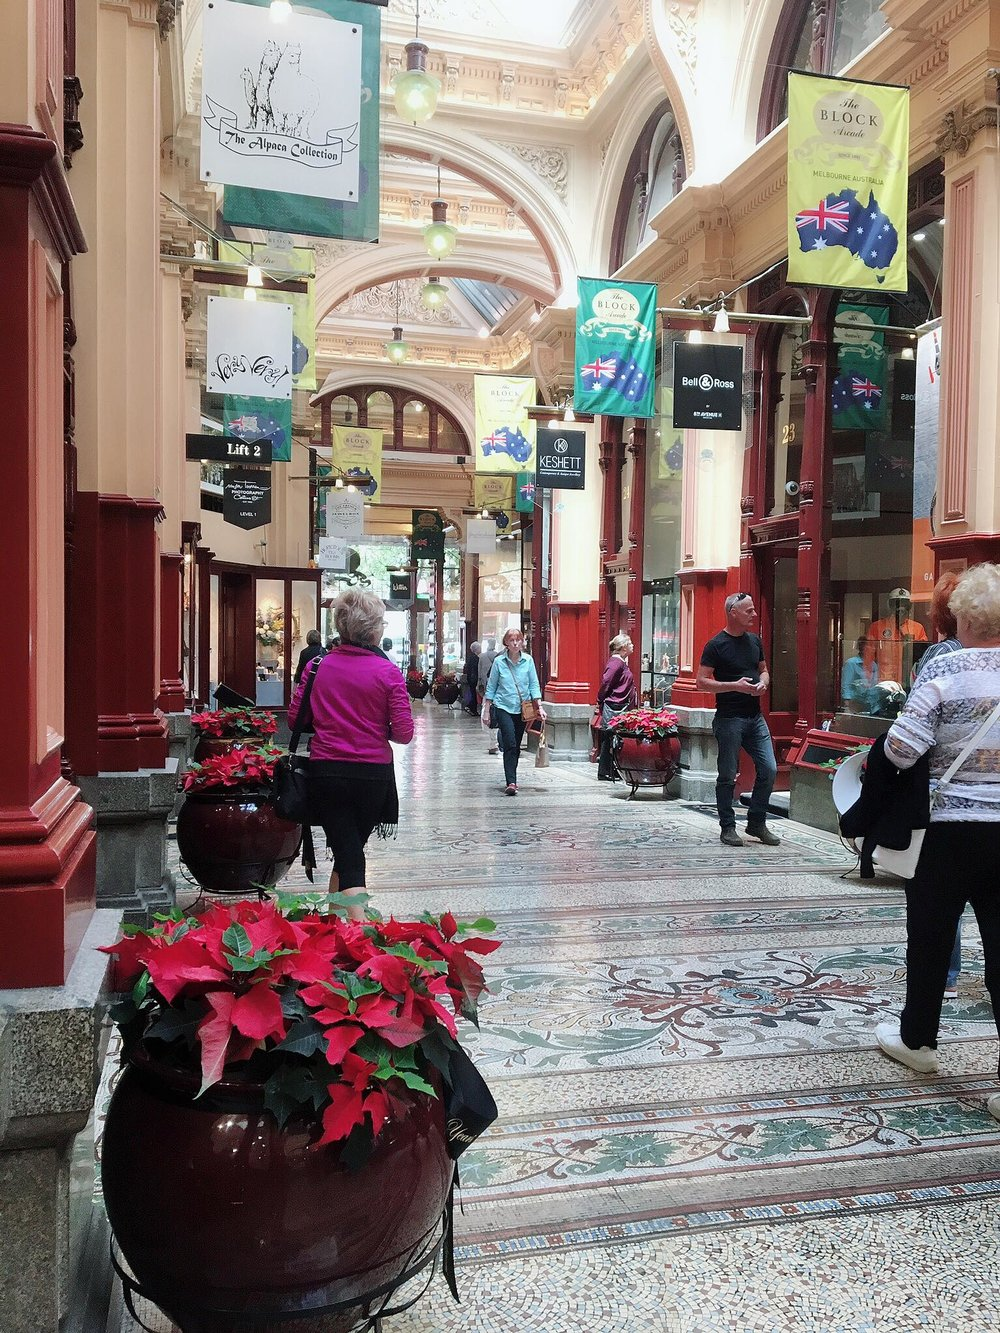 Australias Beautiful Shopping Arcades   The Down Under Series   The Block Corridor   jumpseatjenny   Melbourne, NSW.jpg